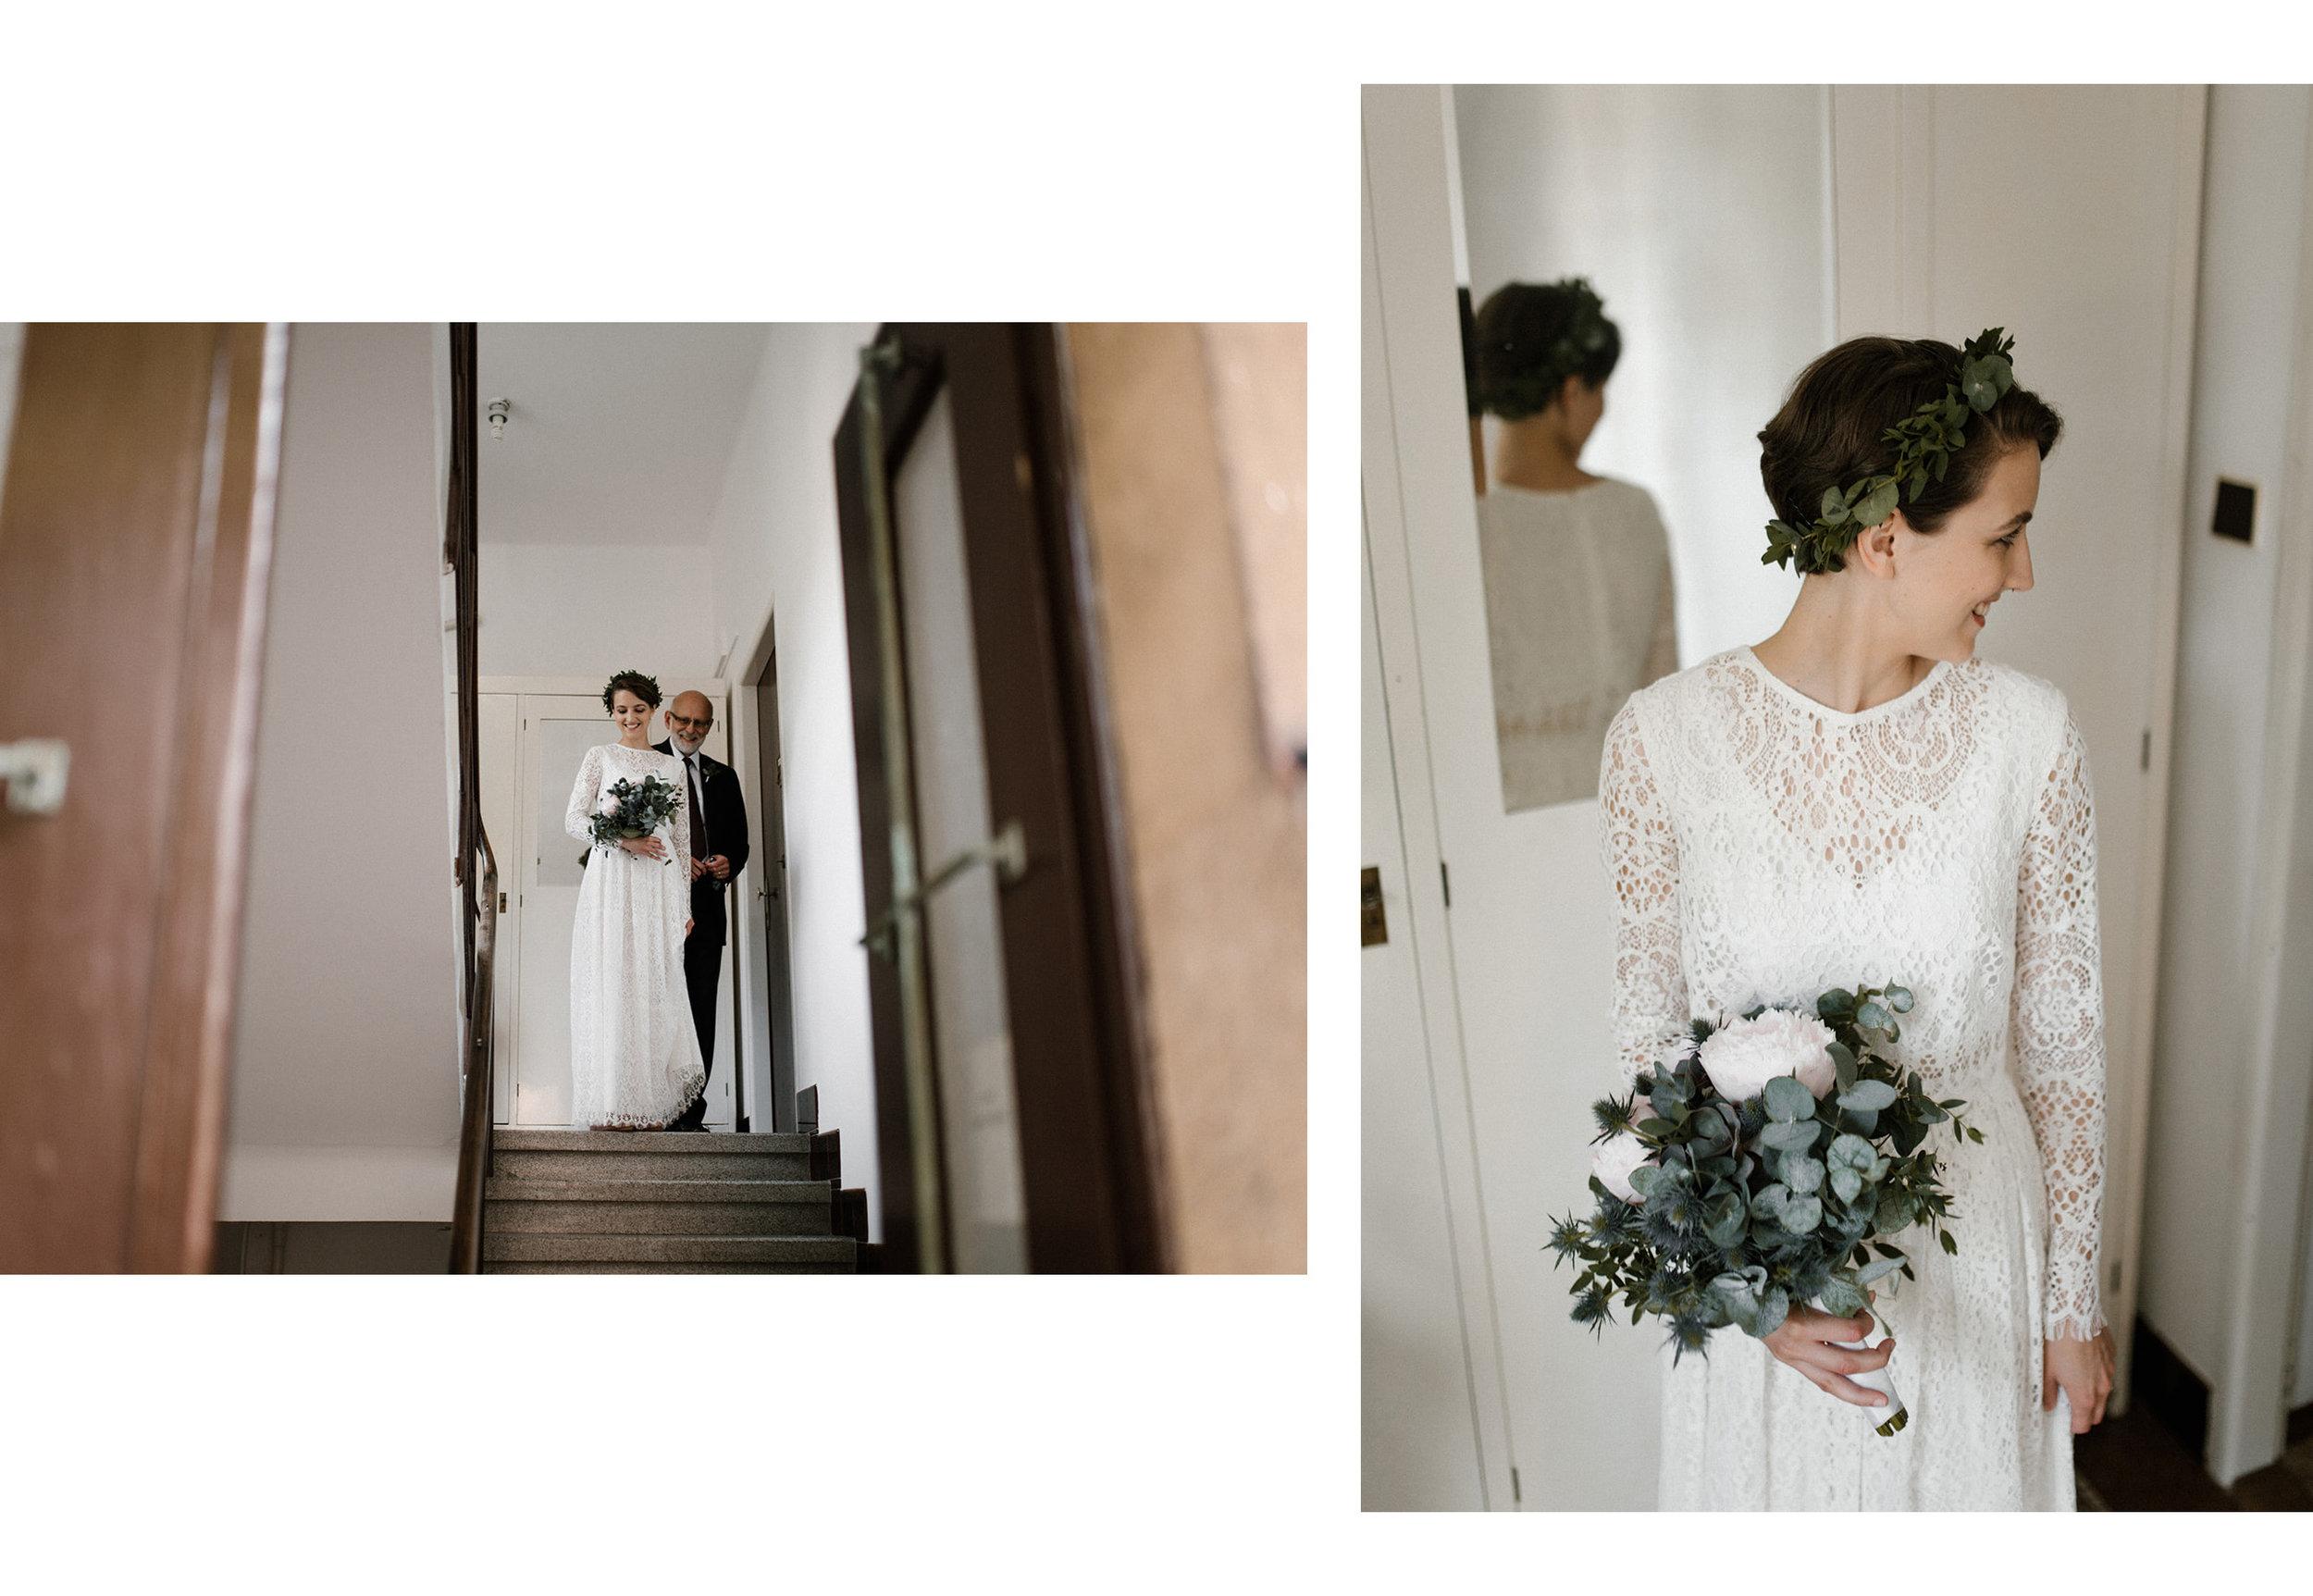 Jaja_Josh_wedding-104.jpg